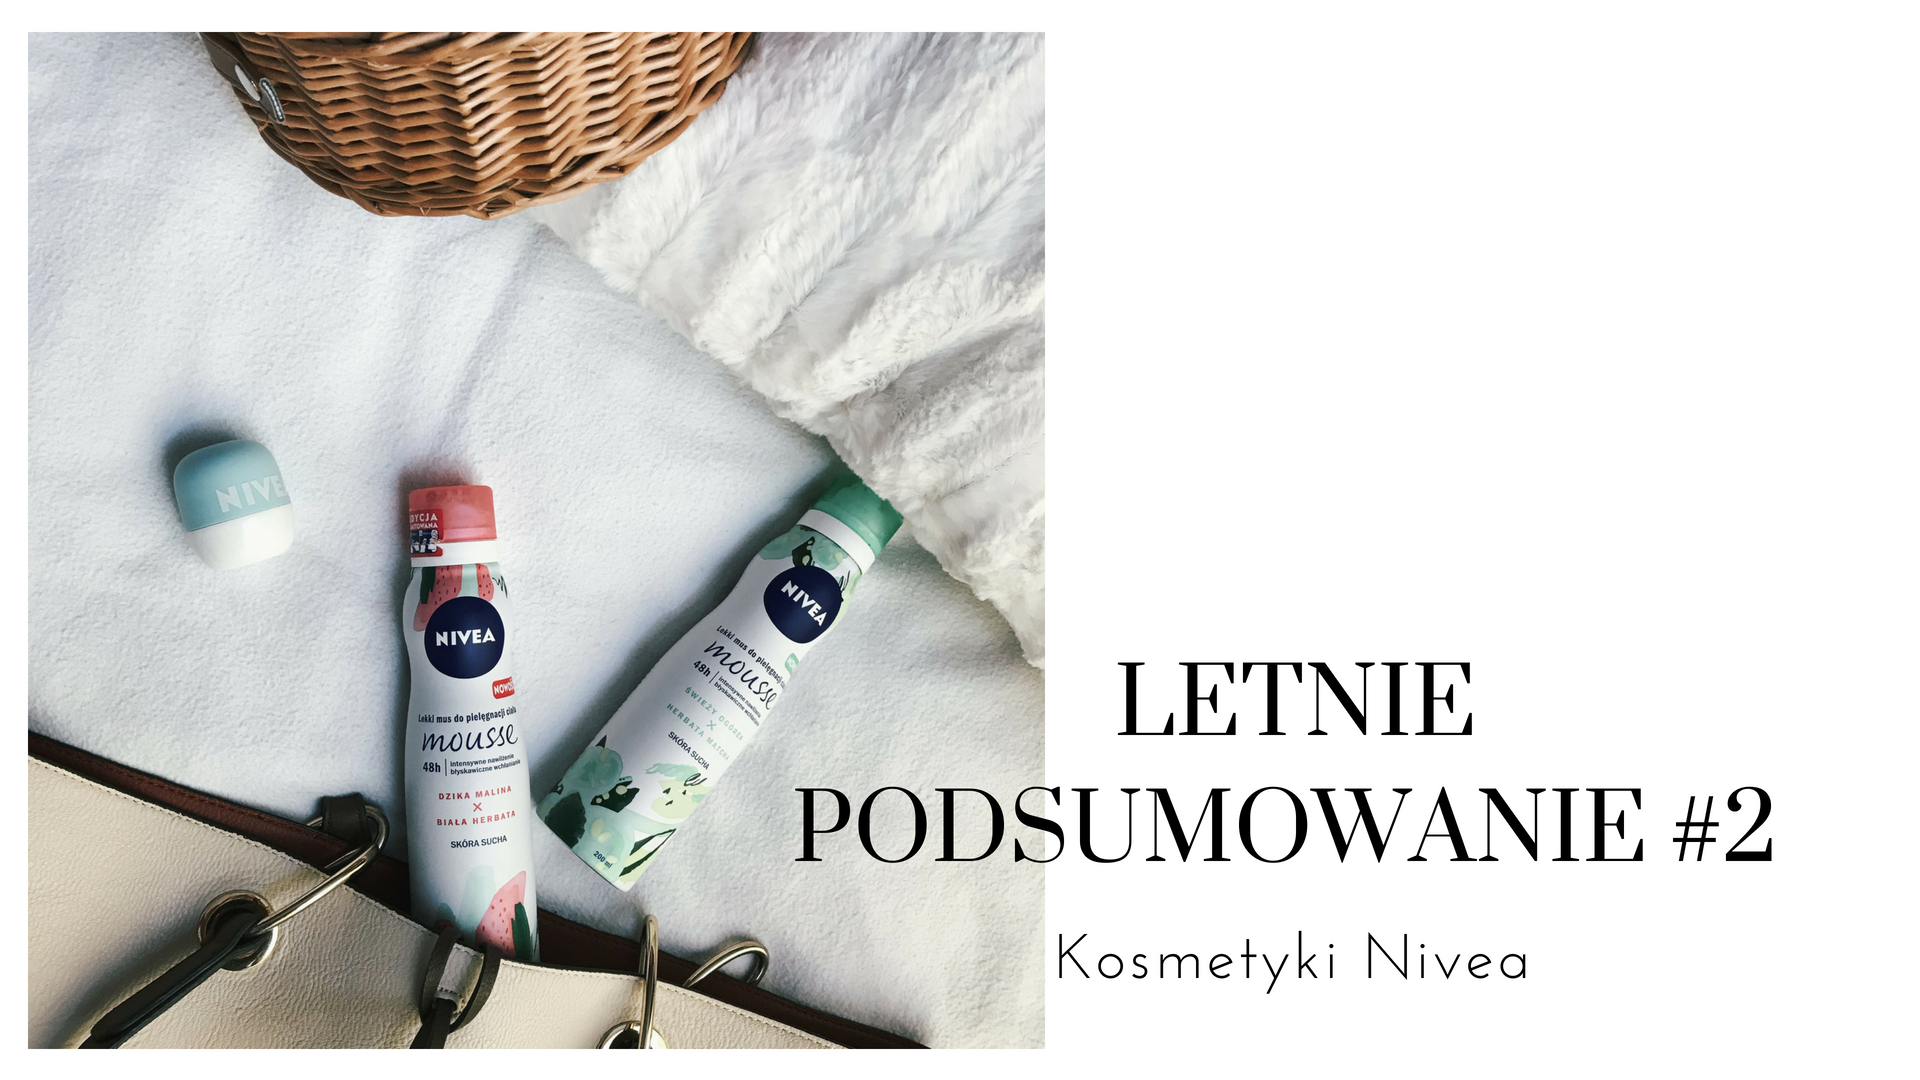 LETNIE PODSUMOWANIE #2 | Kosmetyki Nivea